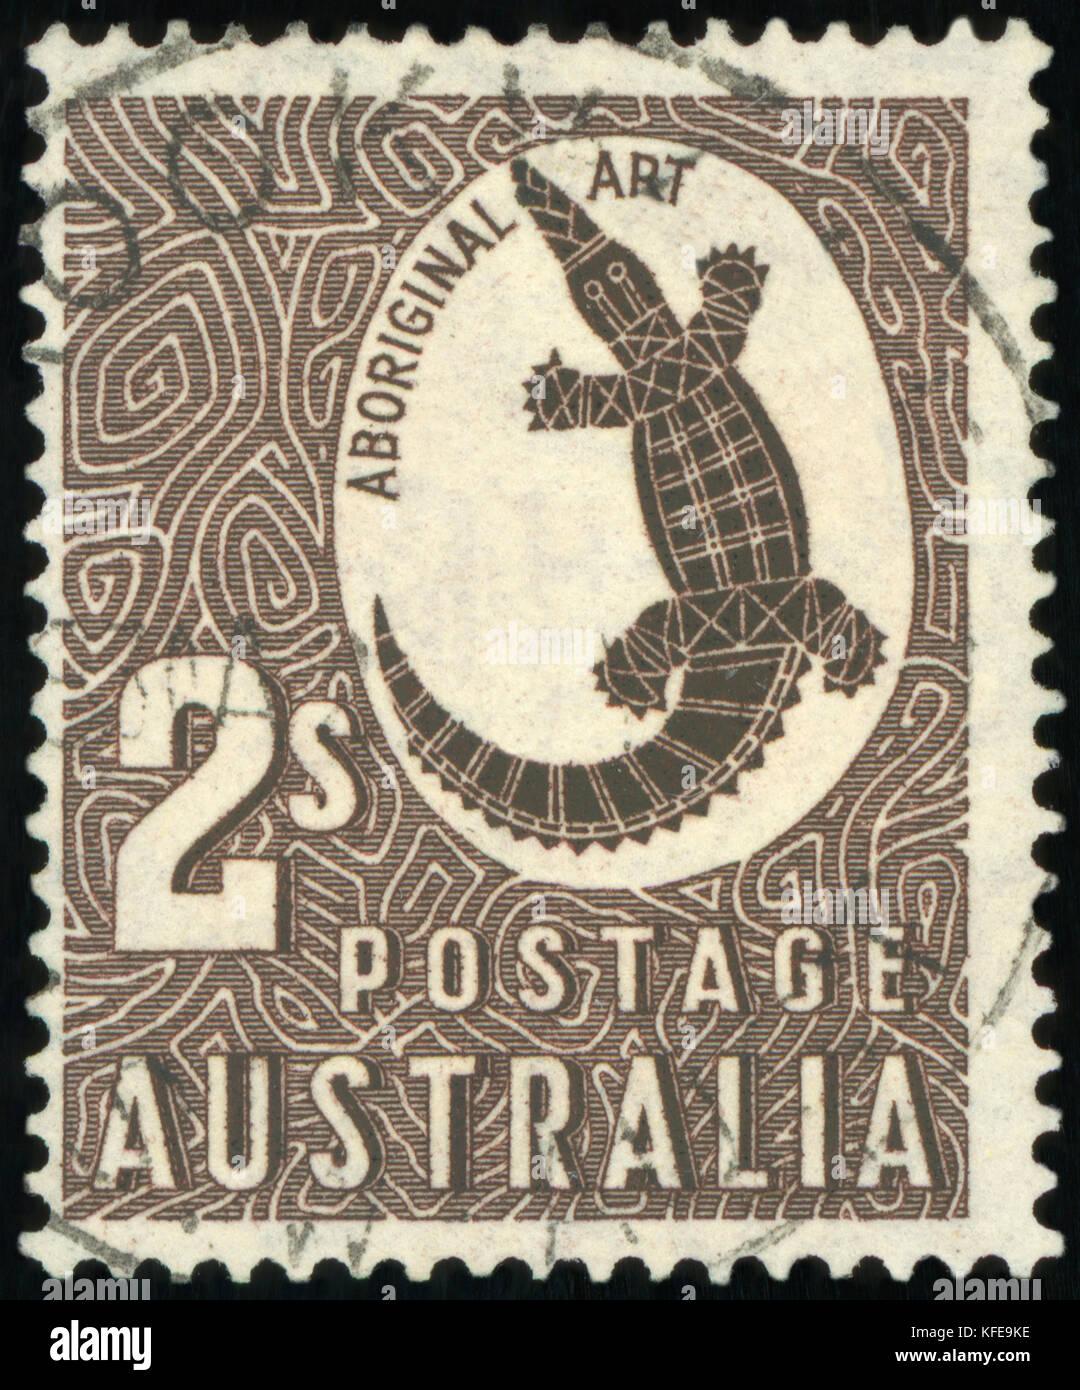 Postage stamp (Australia - Aboriginal Art) - Stock Image